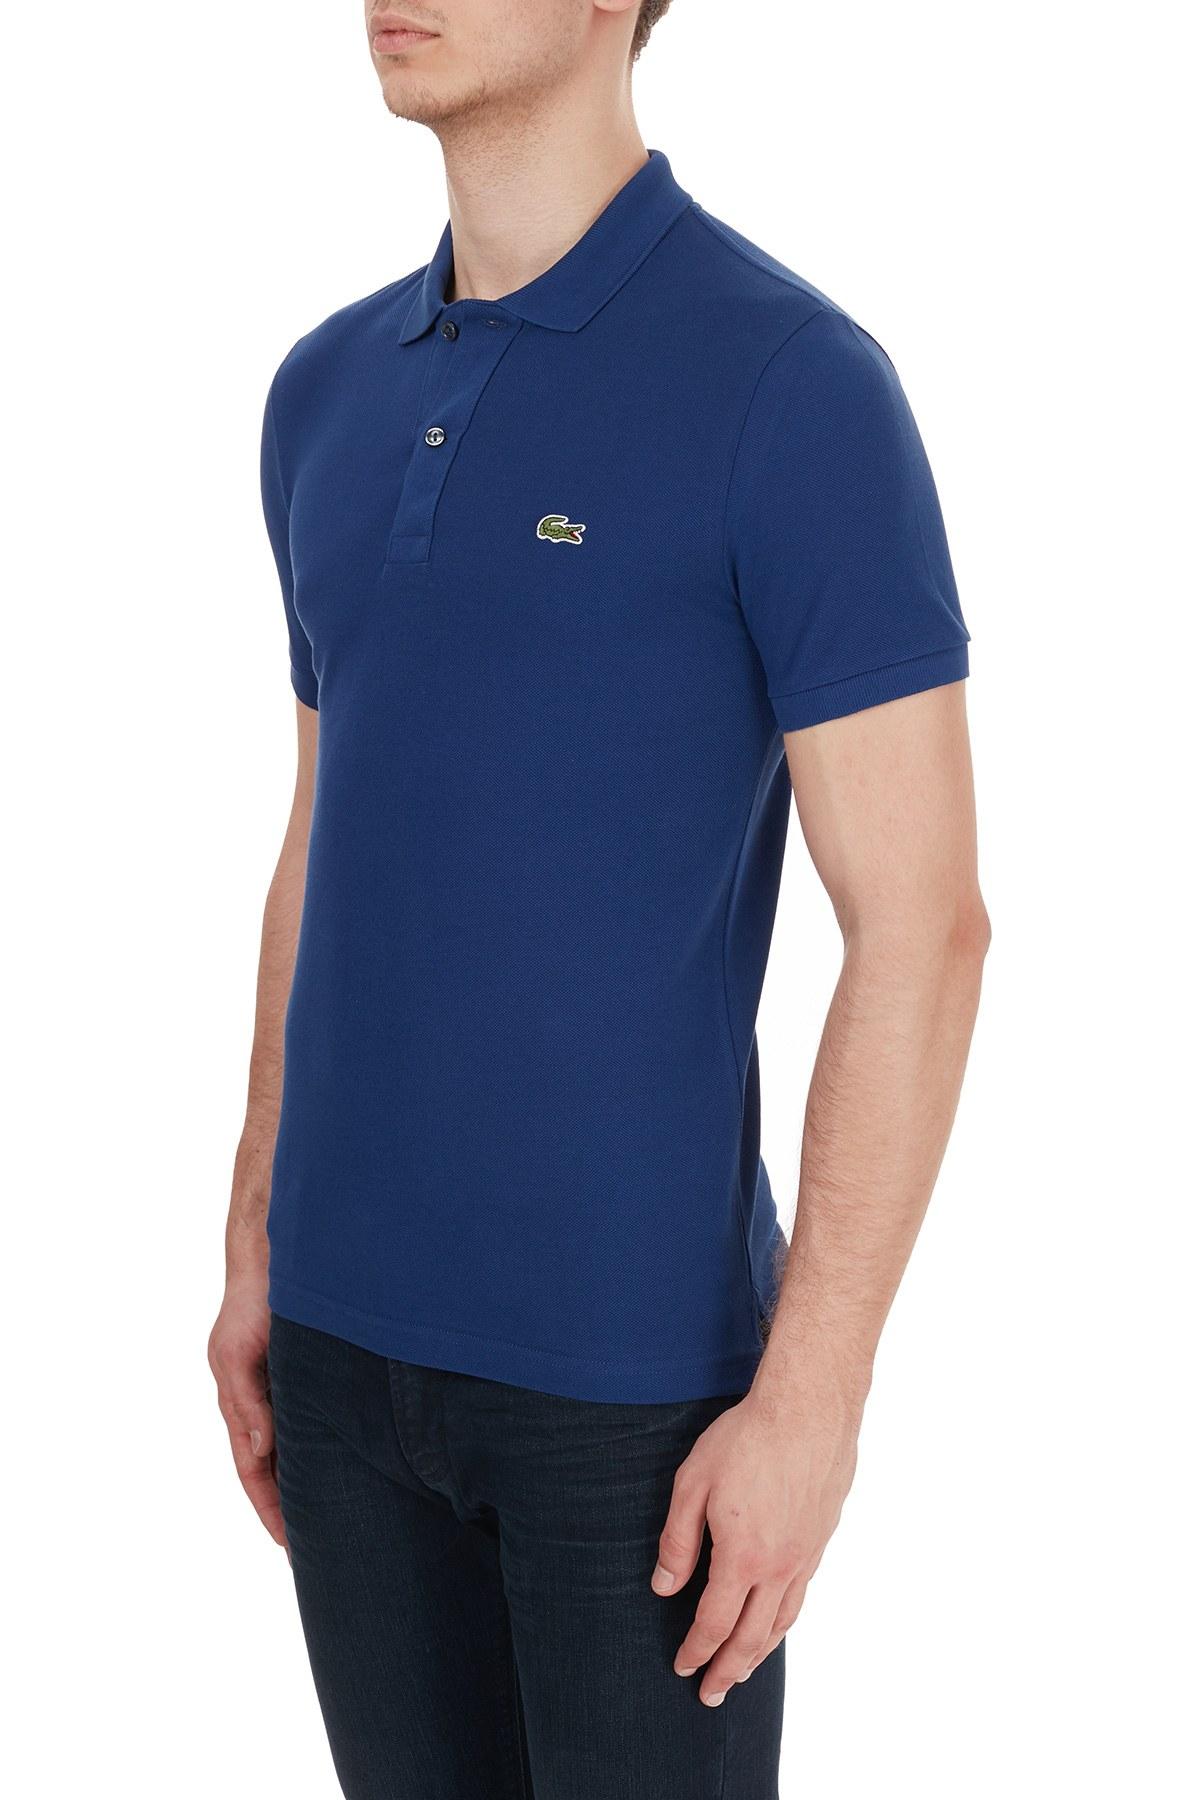 Lacoste Slim Fit % 100 Pamuk Düğmeli T Shirt Erkek Polo PH4012 F9F SAKS-MAVİ